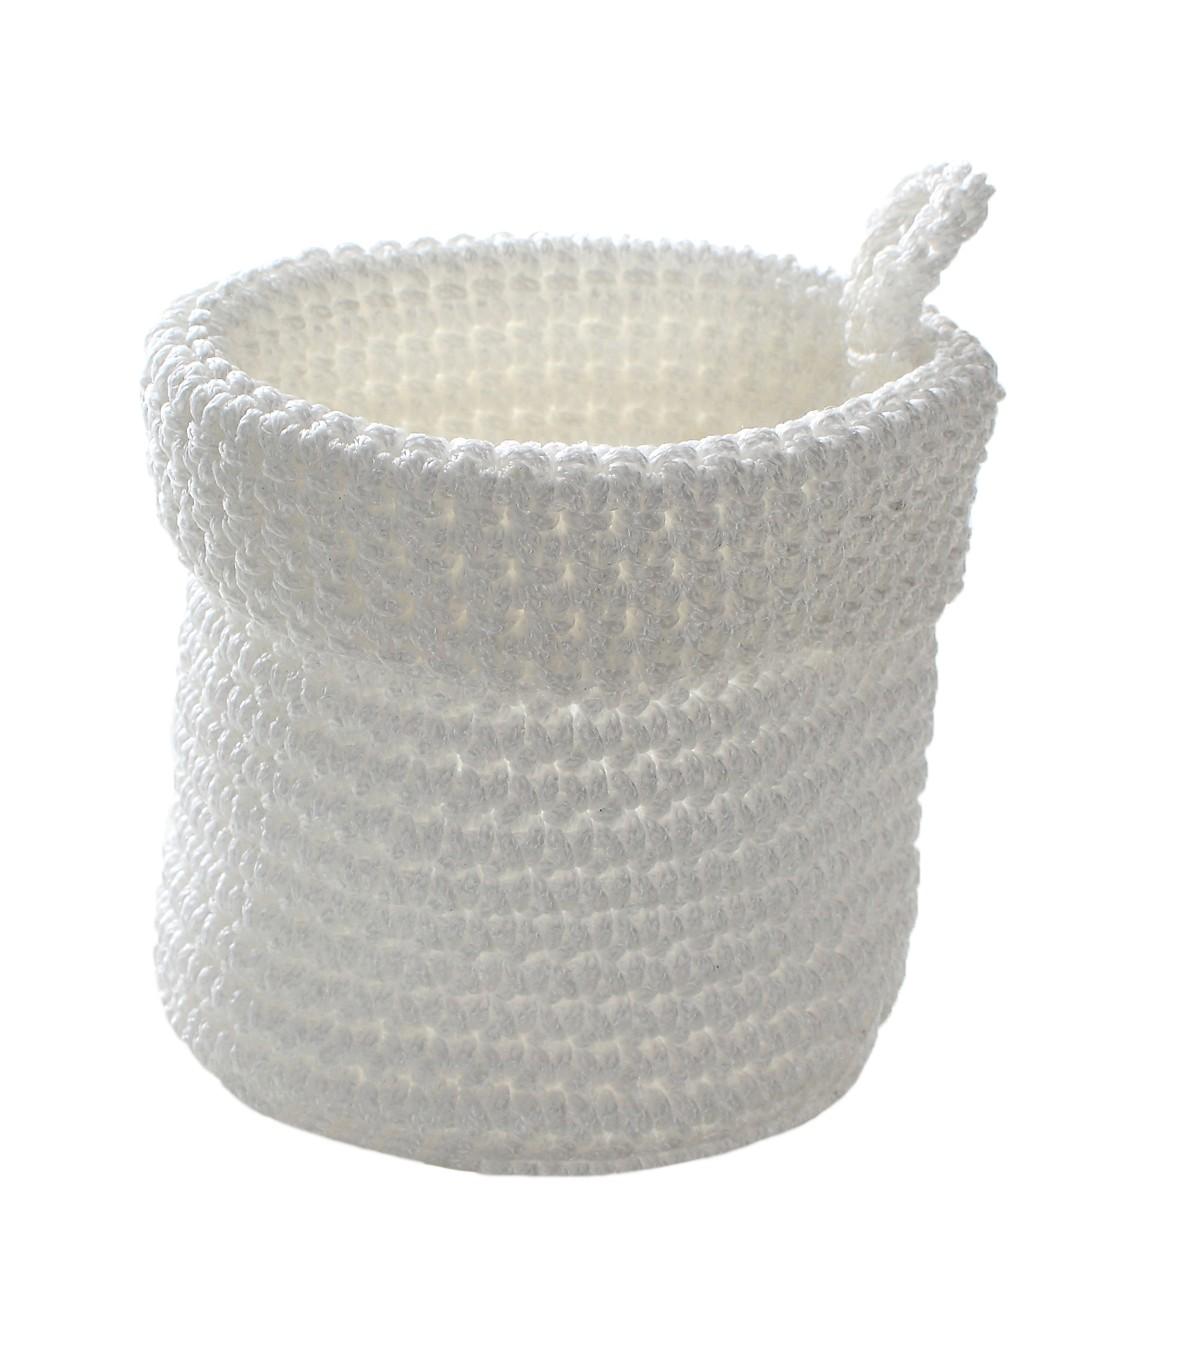 Panier rond maille crochet 12x10cm - Blanc